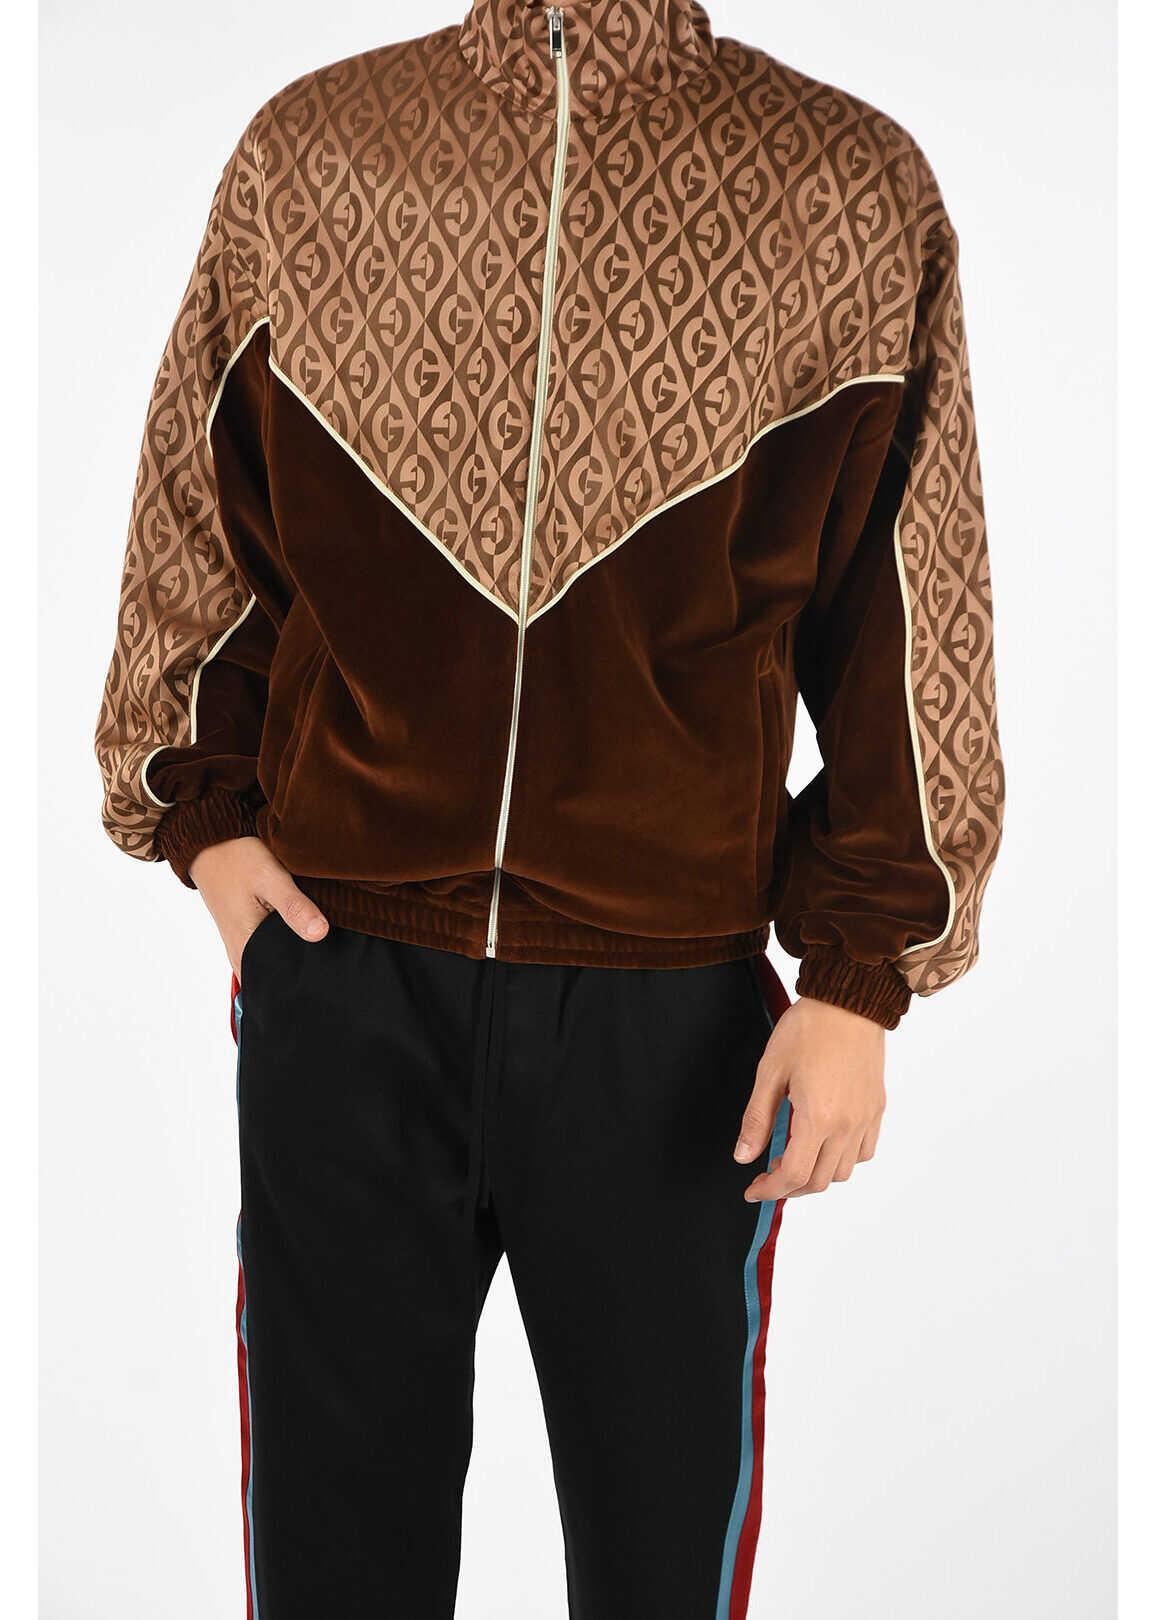 Gucci Velvet Embroidered Sweashirt BROWN